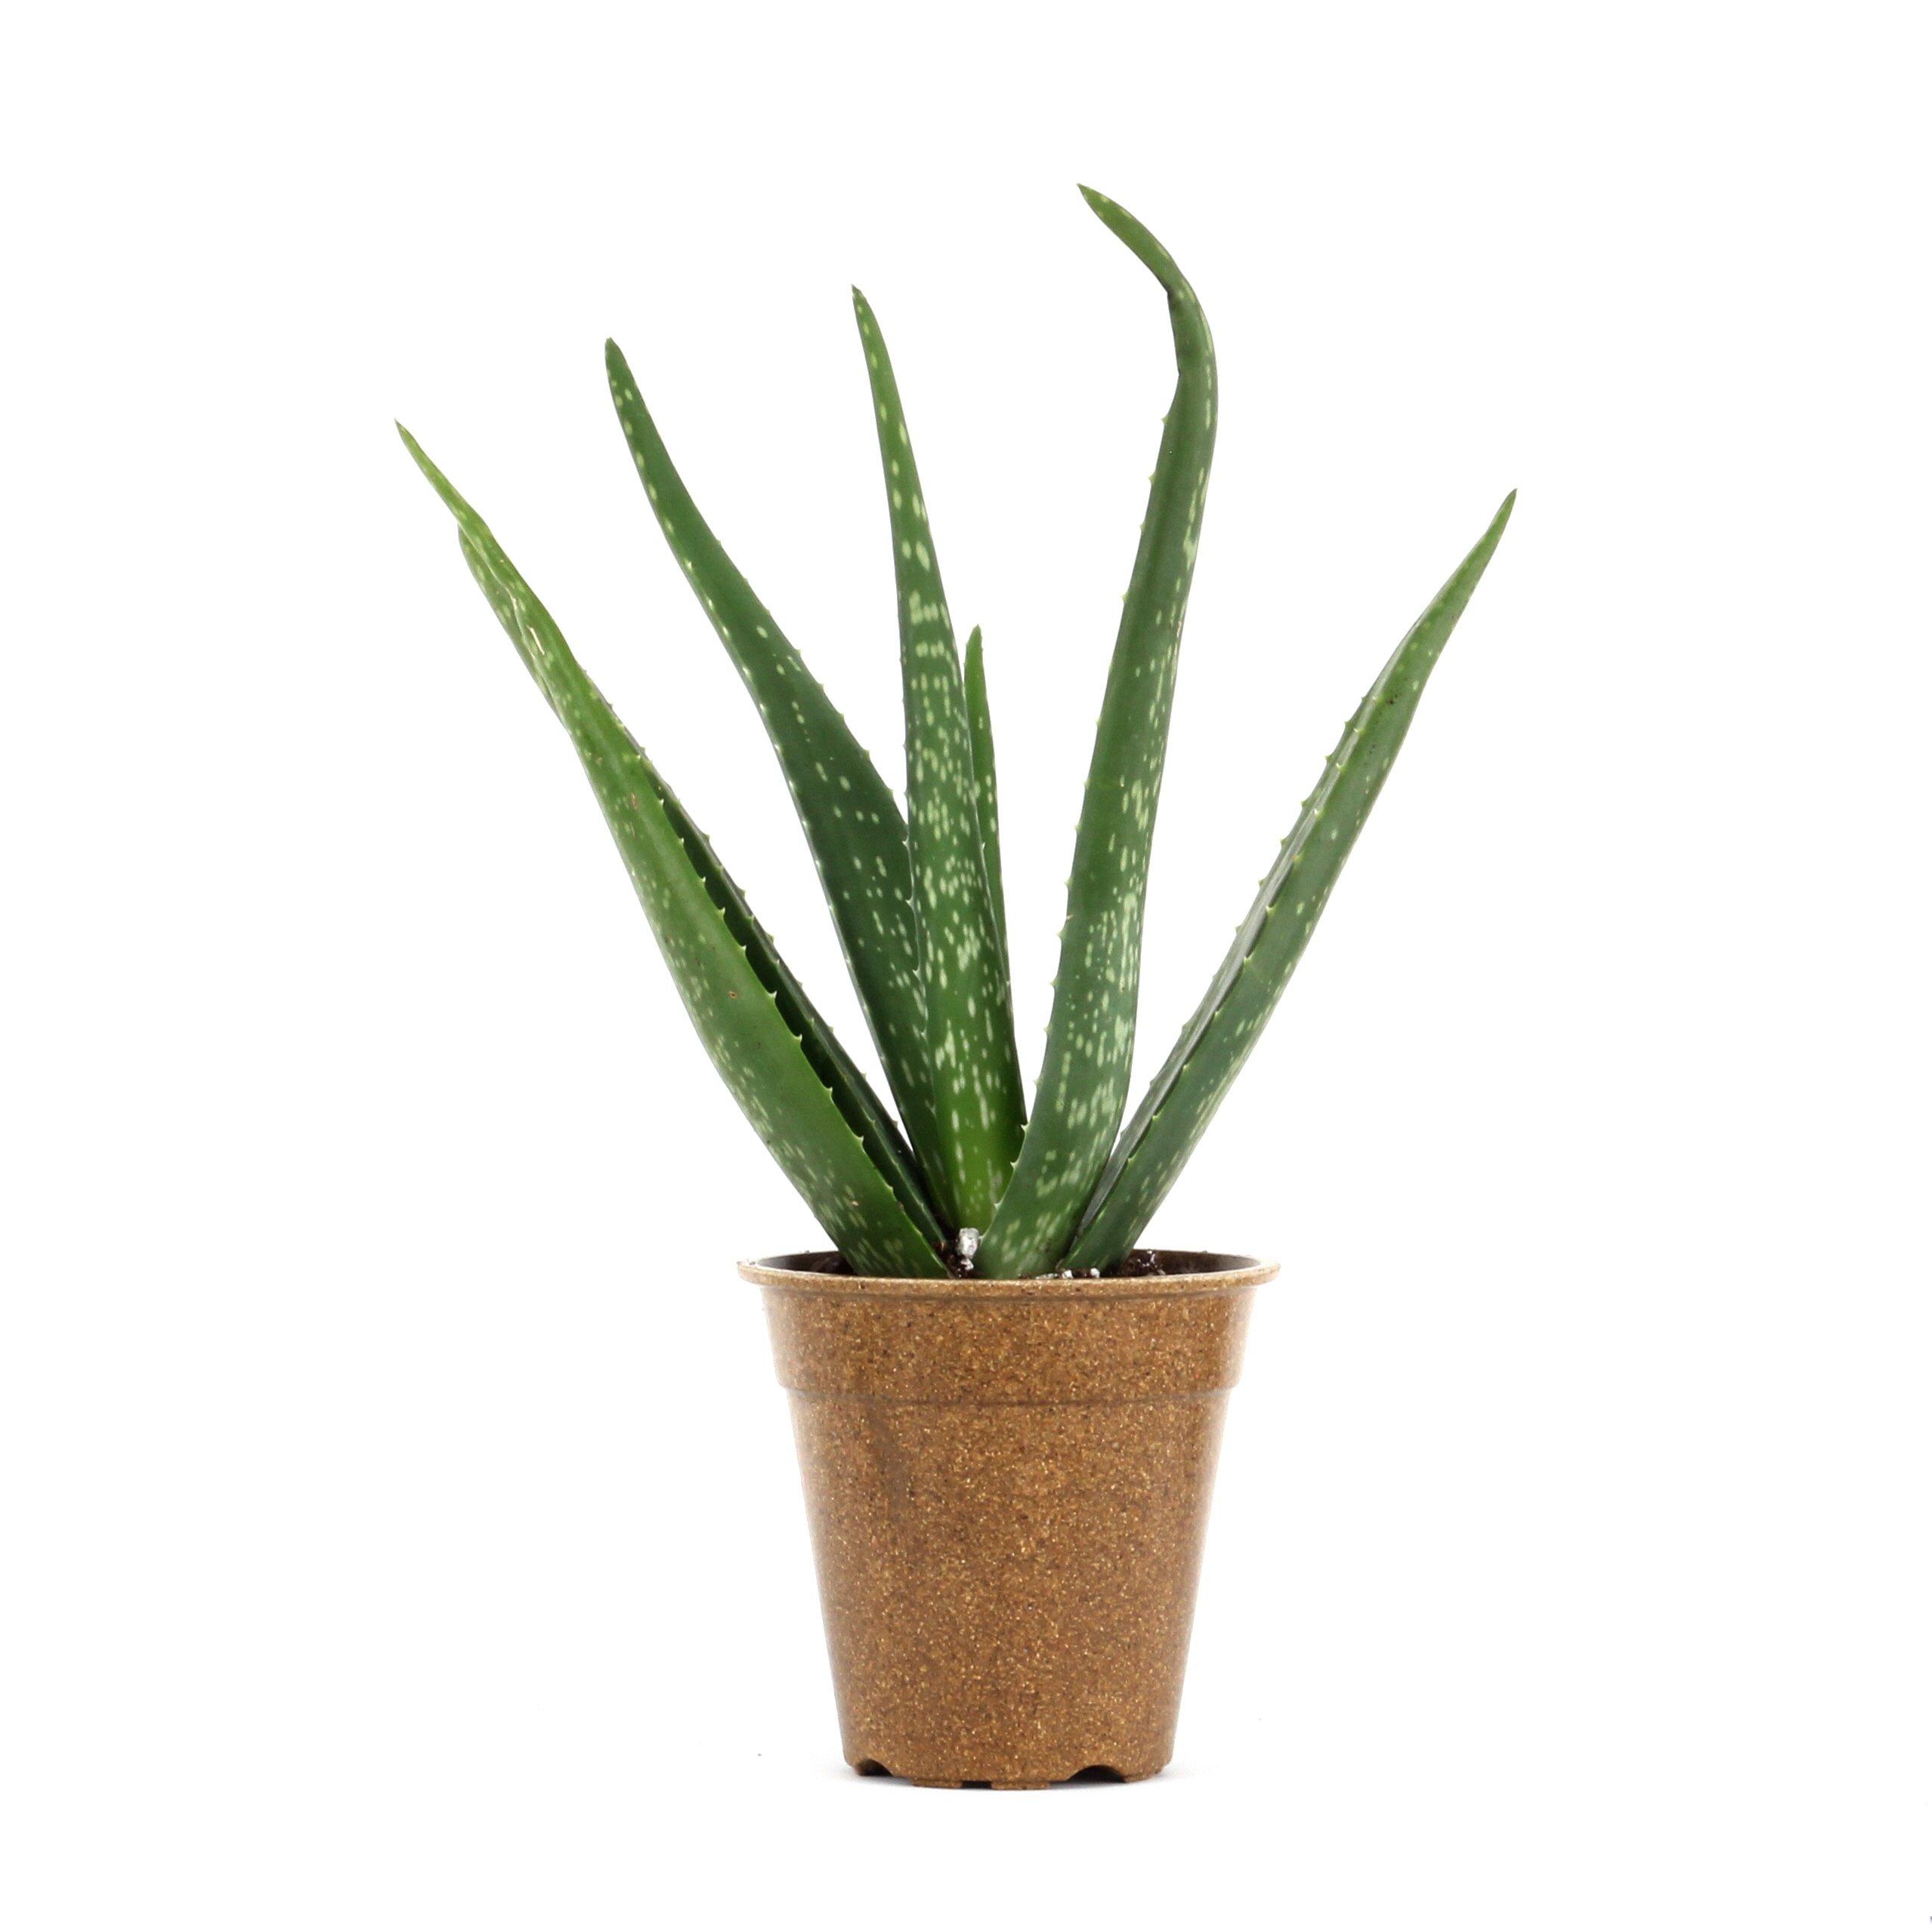 Clean Air Plant in Eco-Friendly Pot - Aloe vera